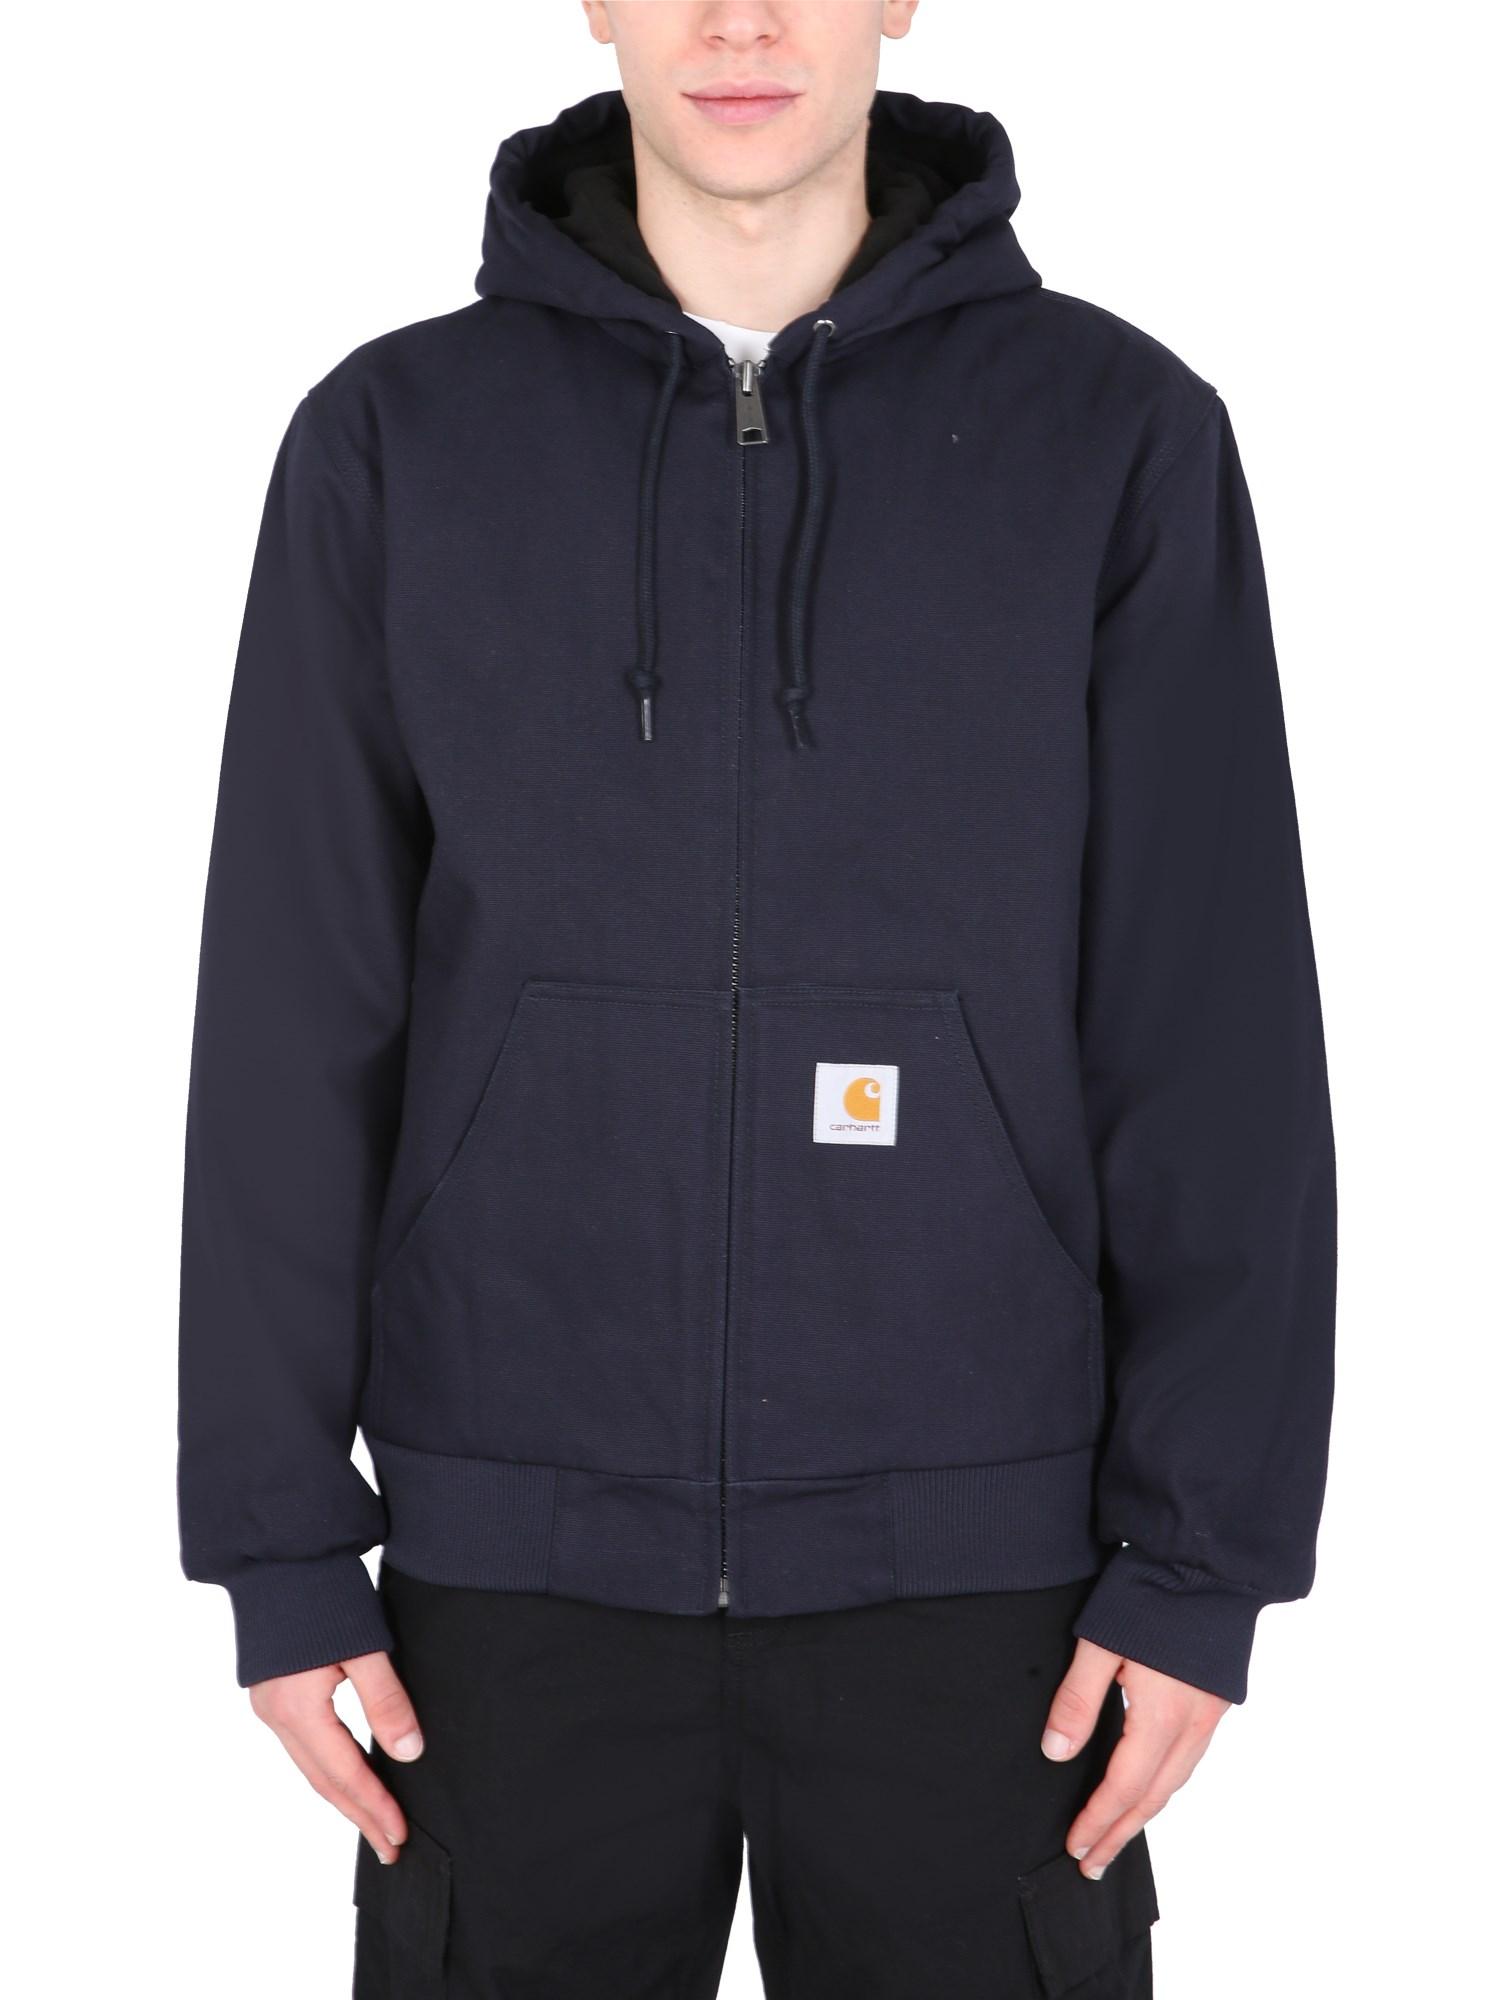 Carhartt wip jacket with zip - carhartt wip - Modalova